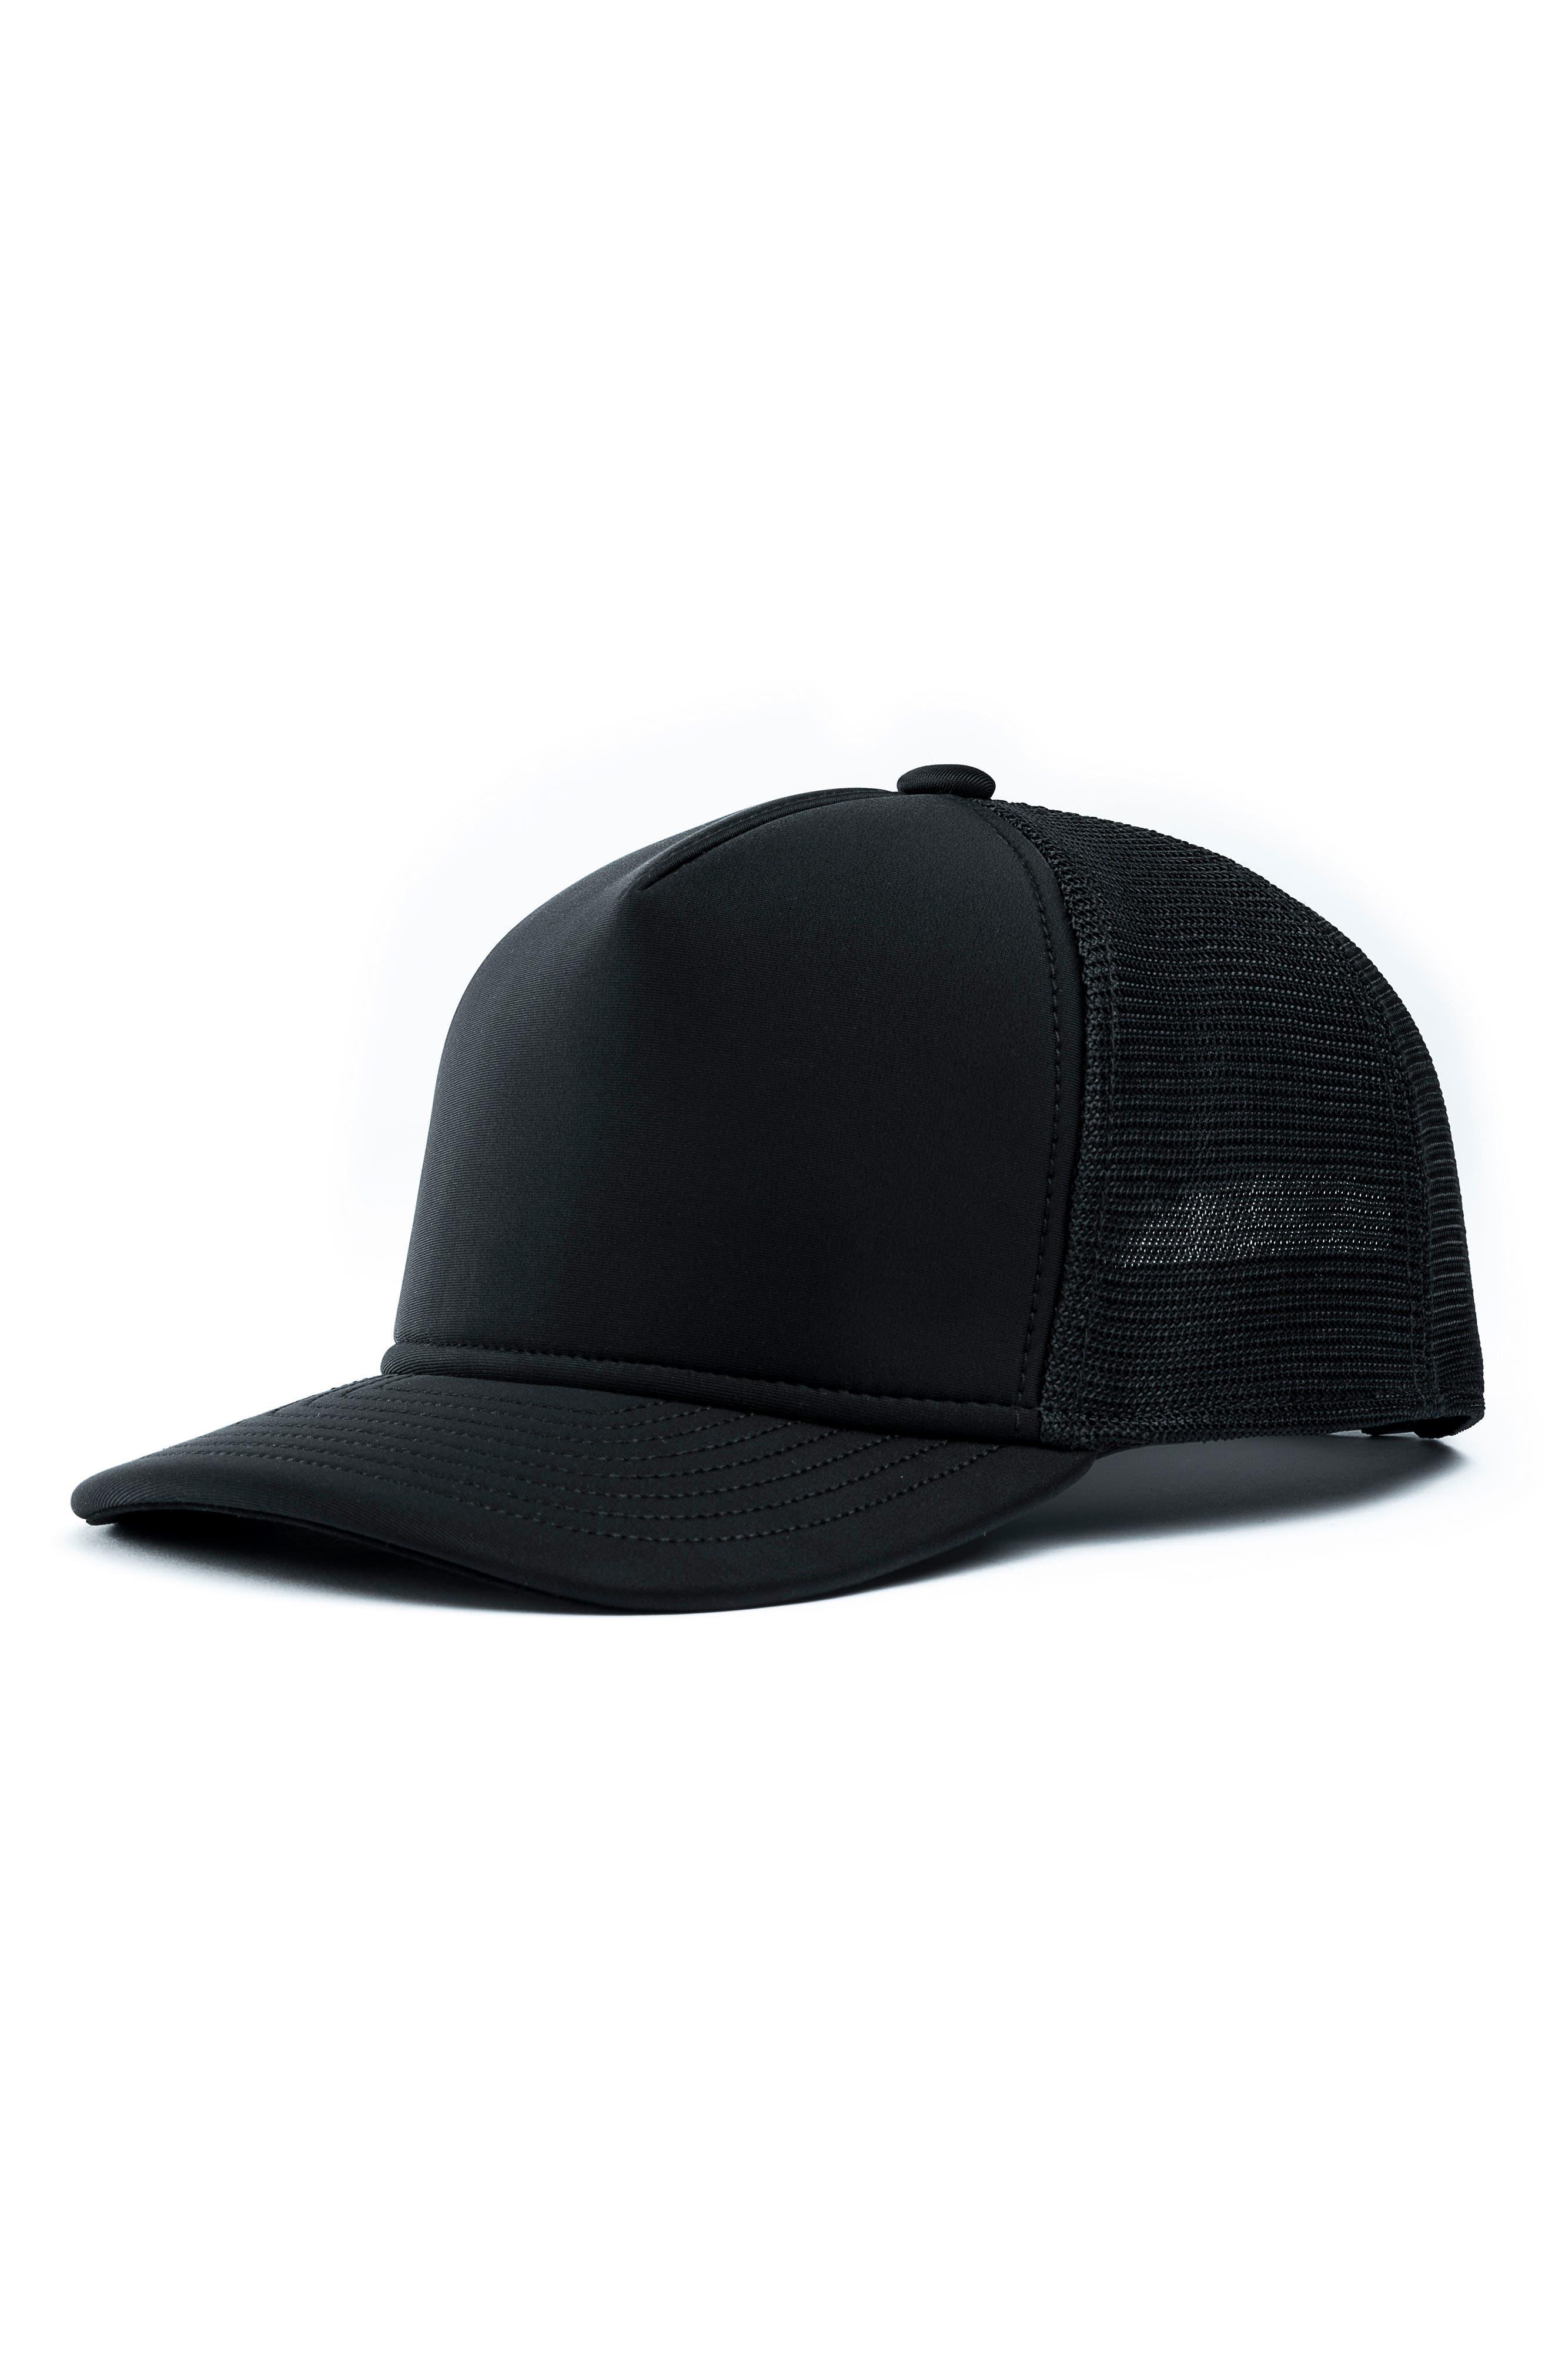 Melin The Marksman Mesh Cap